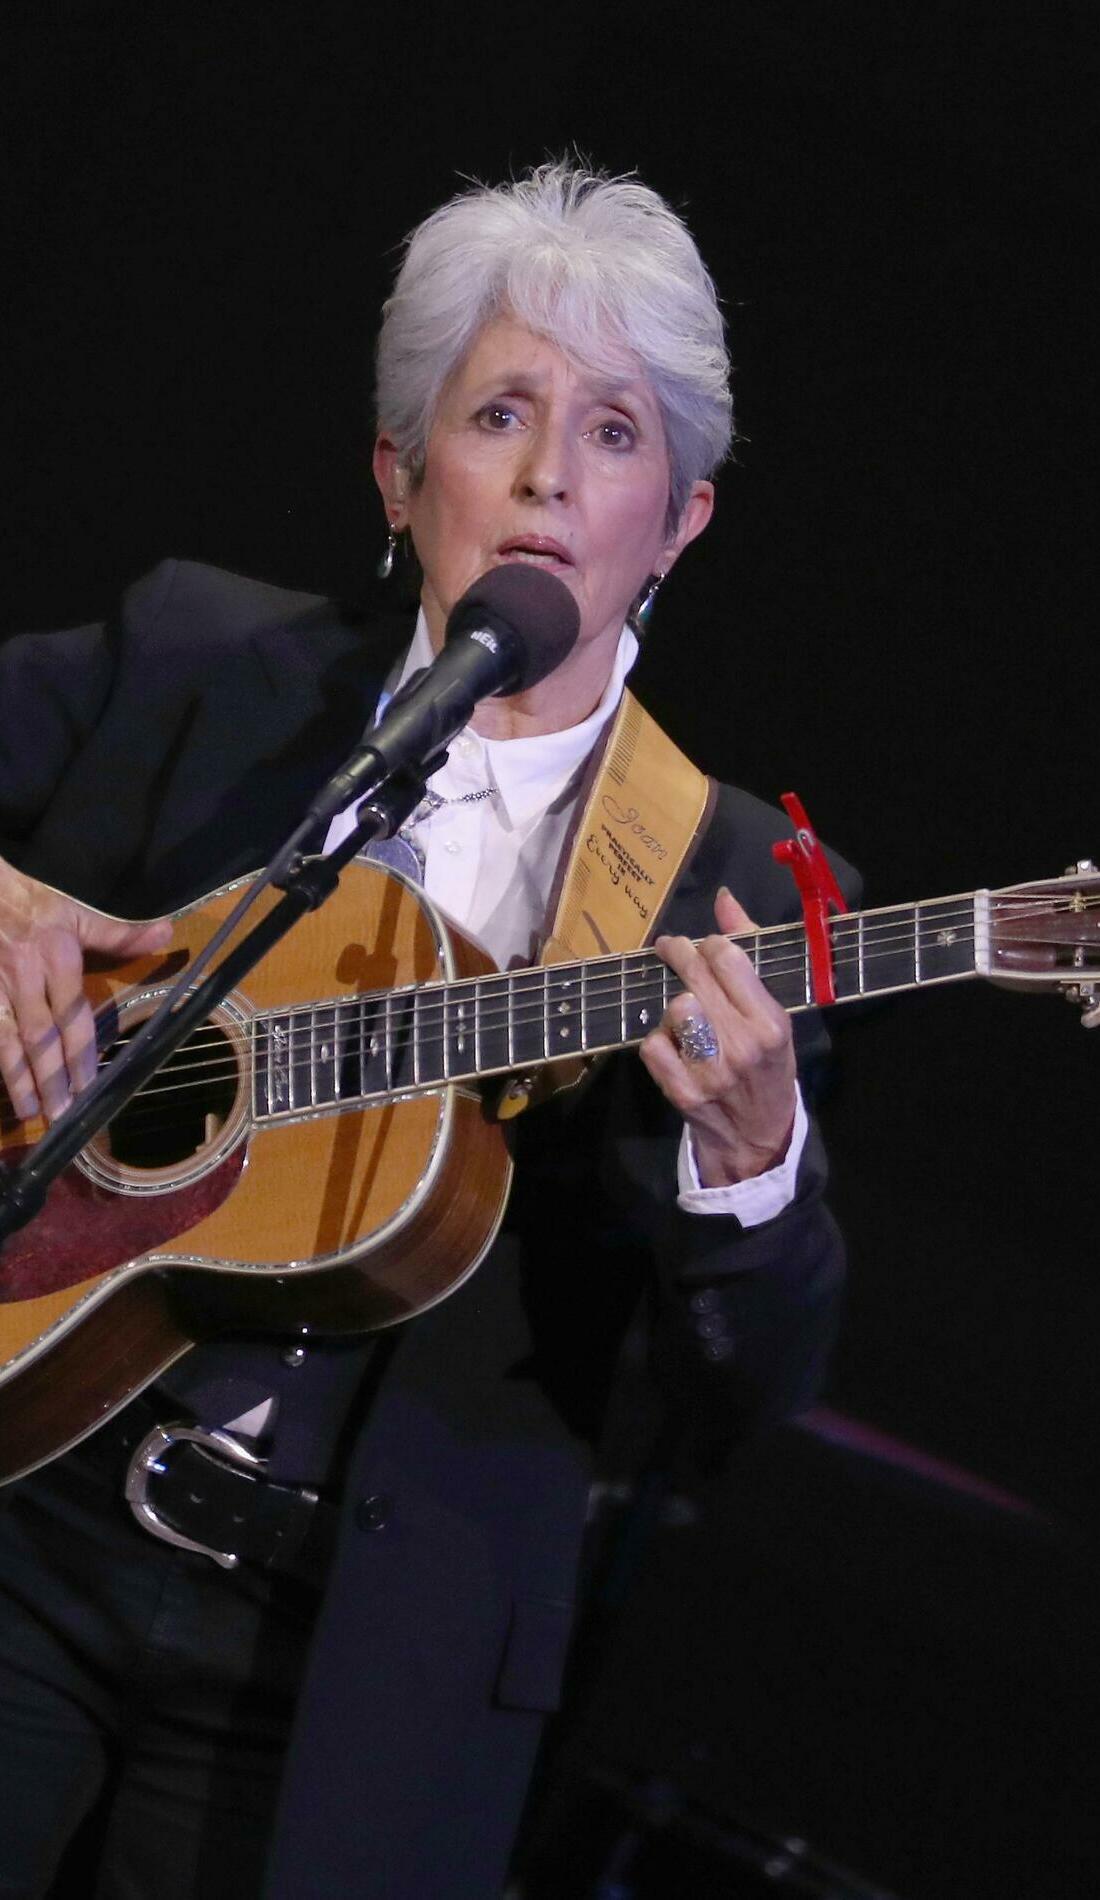 A Joan Baez live event